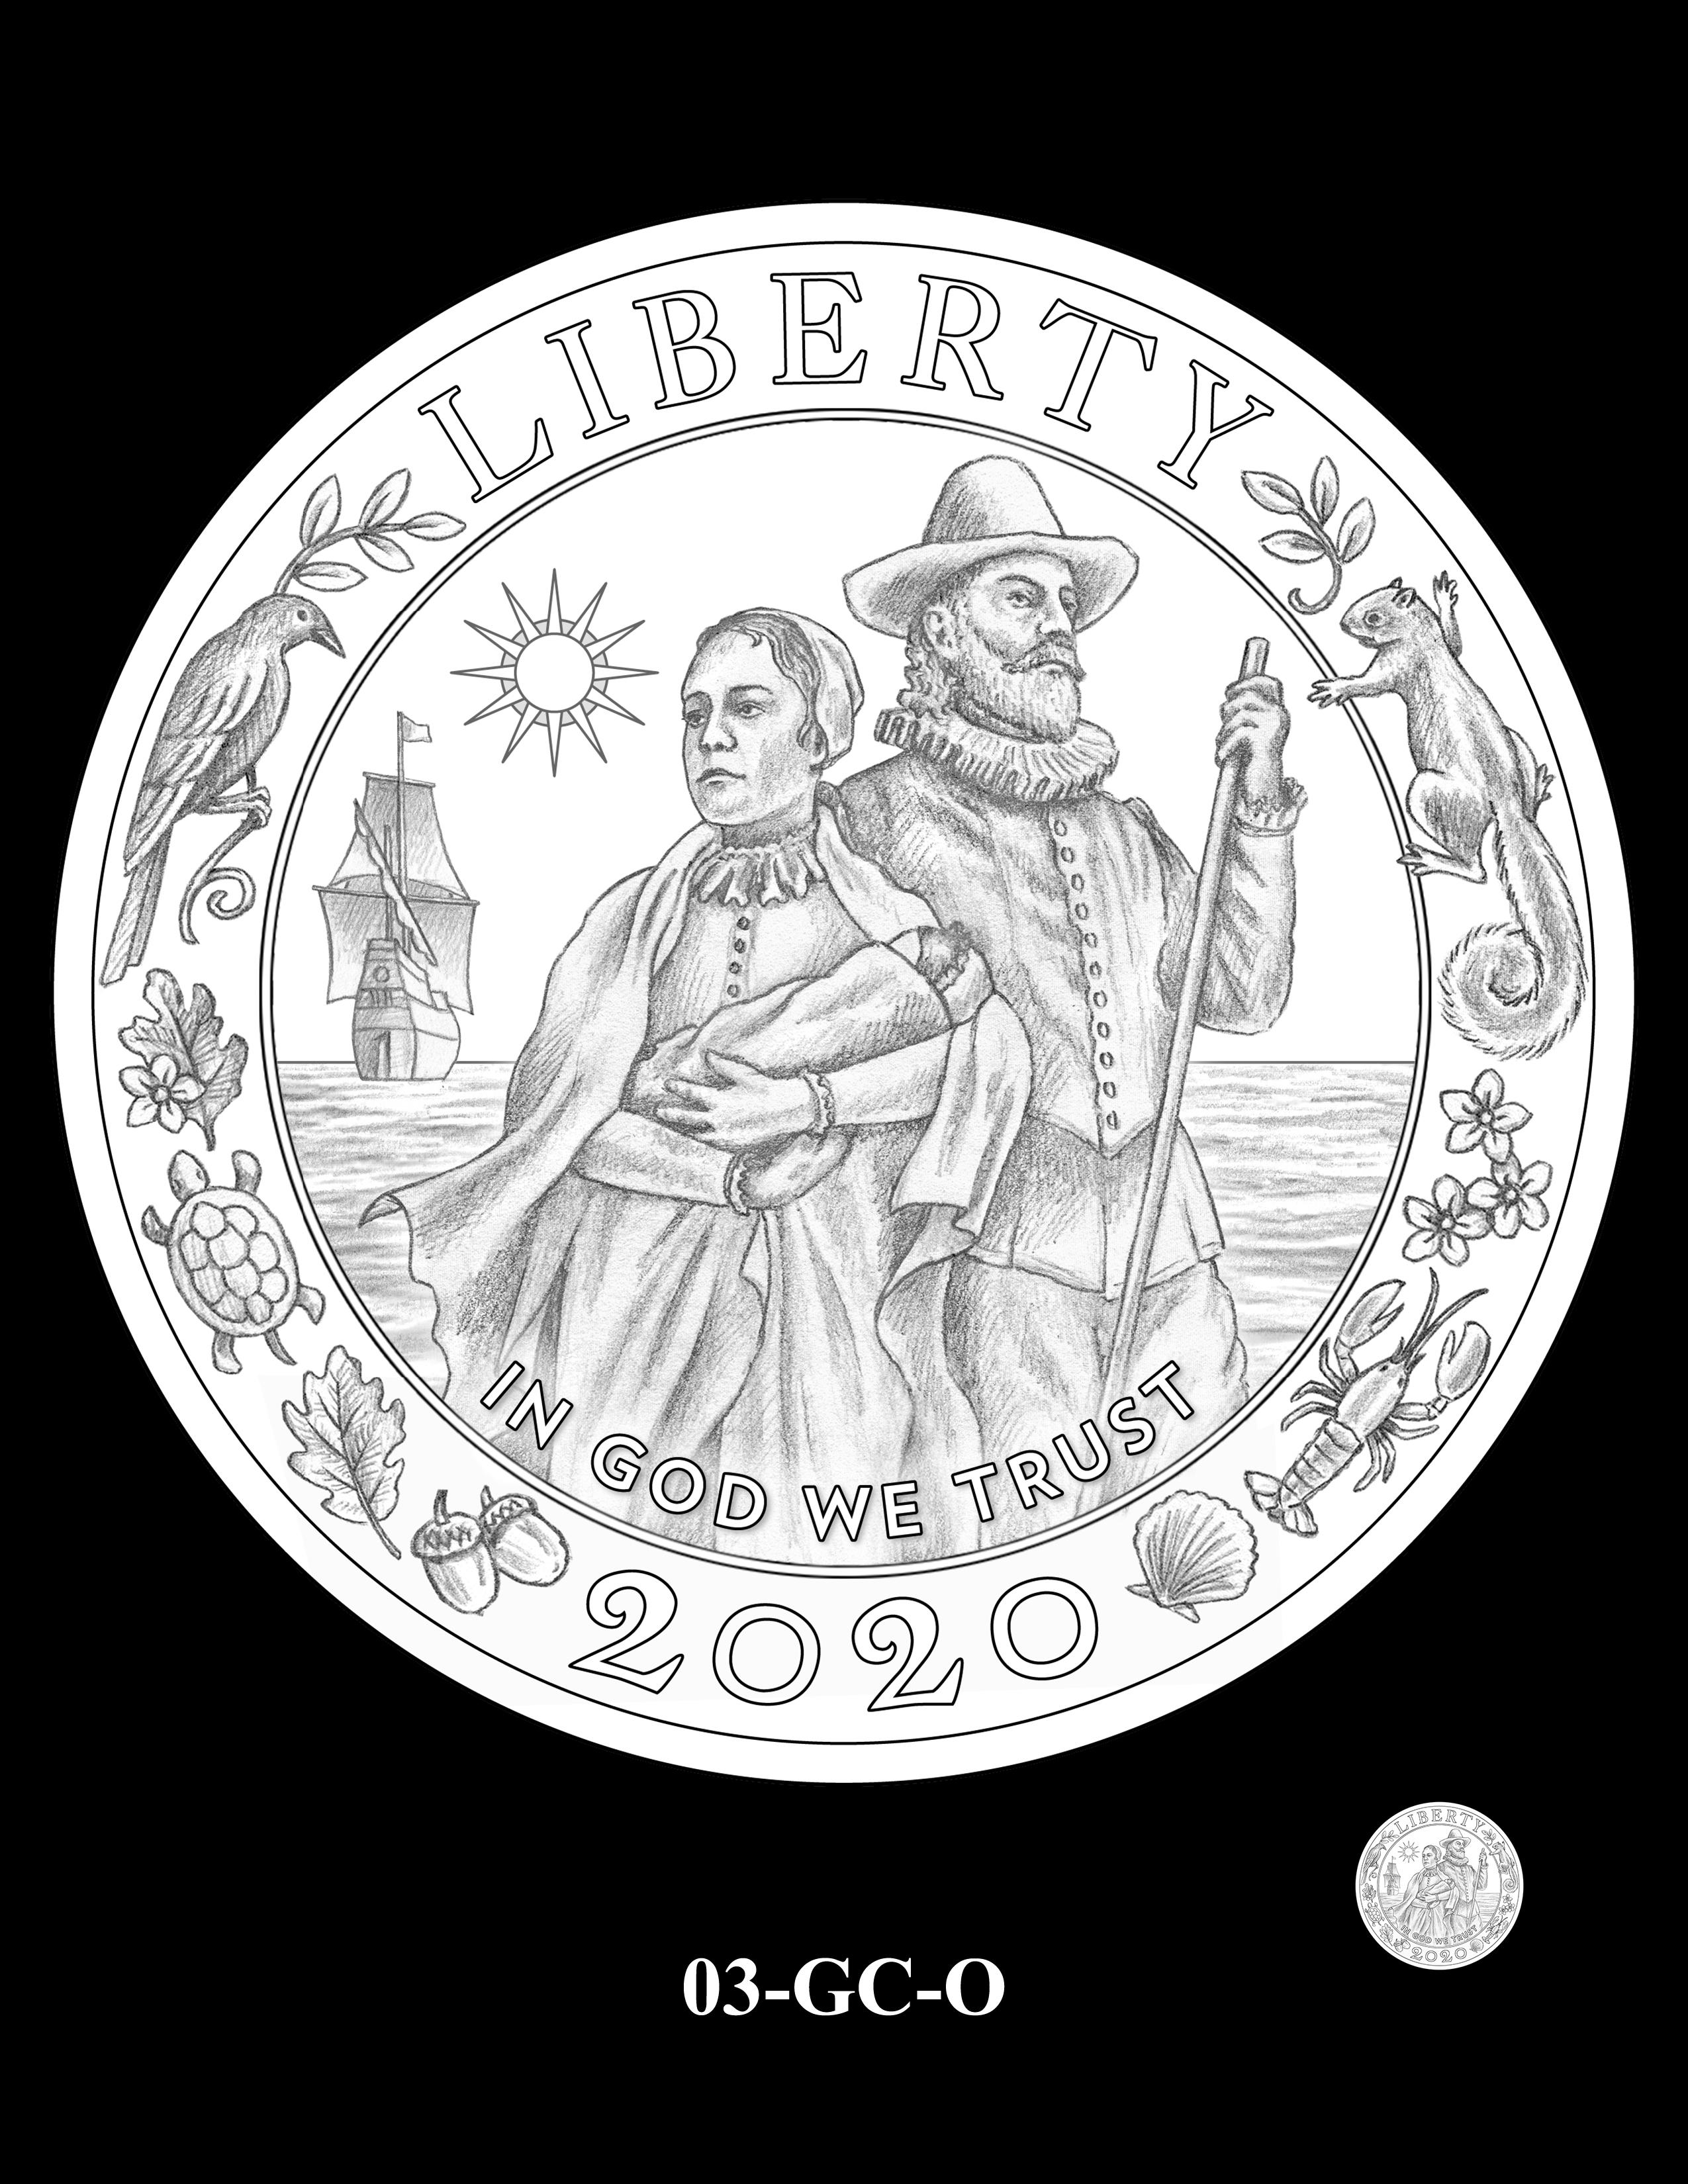 03-GC-O - 2020 Mayflower 400th Anniversary 24K Gold Coin & Silver Medal Program